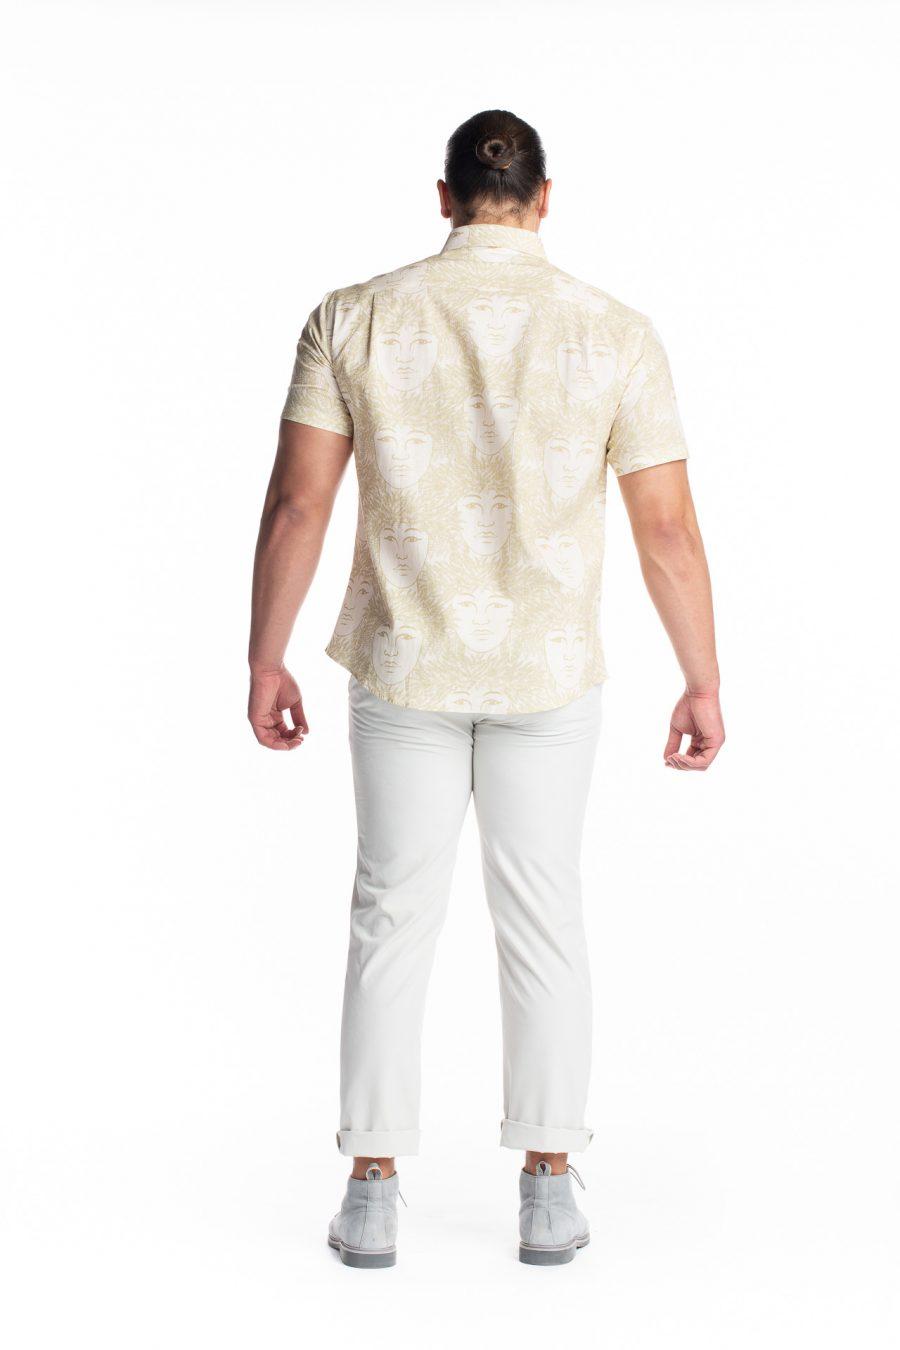 Male model wearing Aloha Short Sleeve in White Swan/Sage Green/Laukapalili - Back View